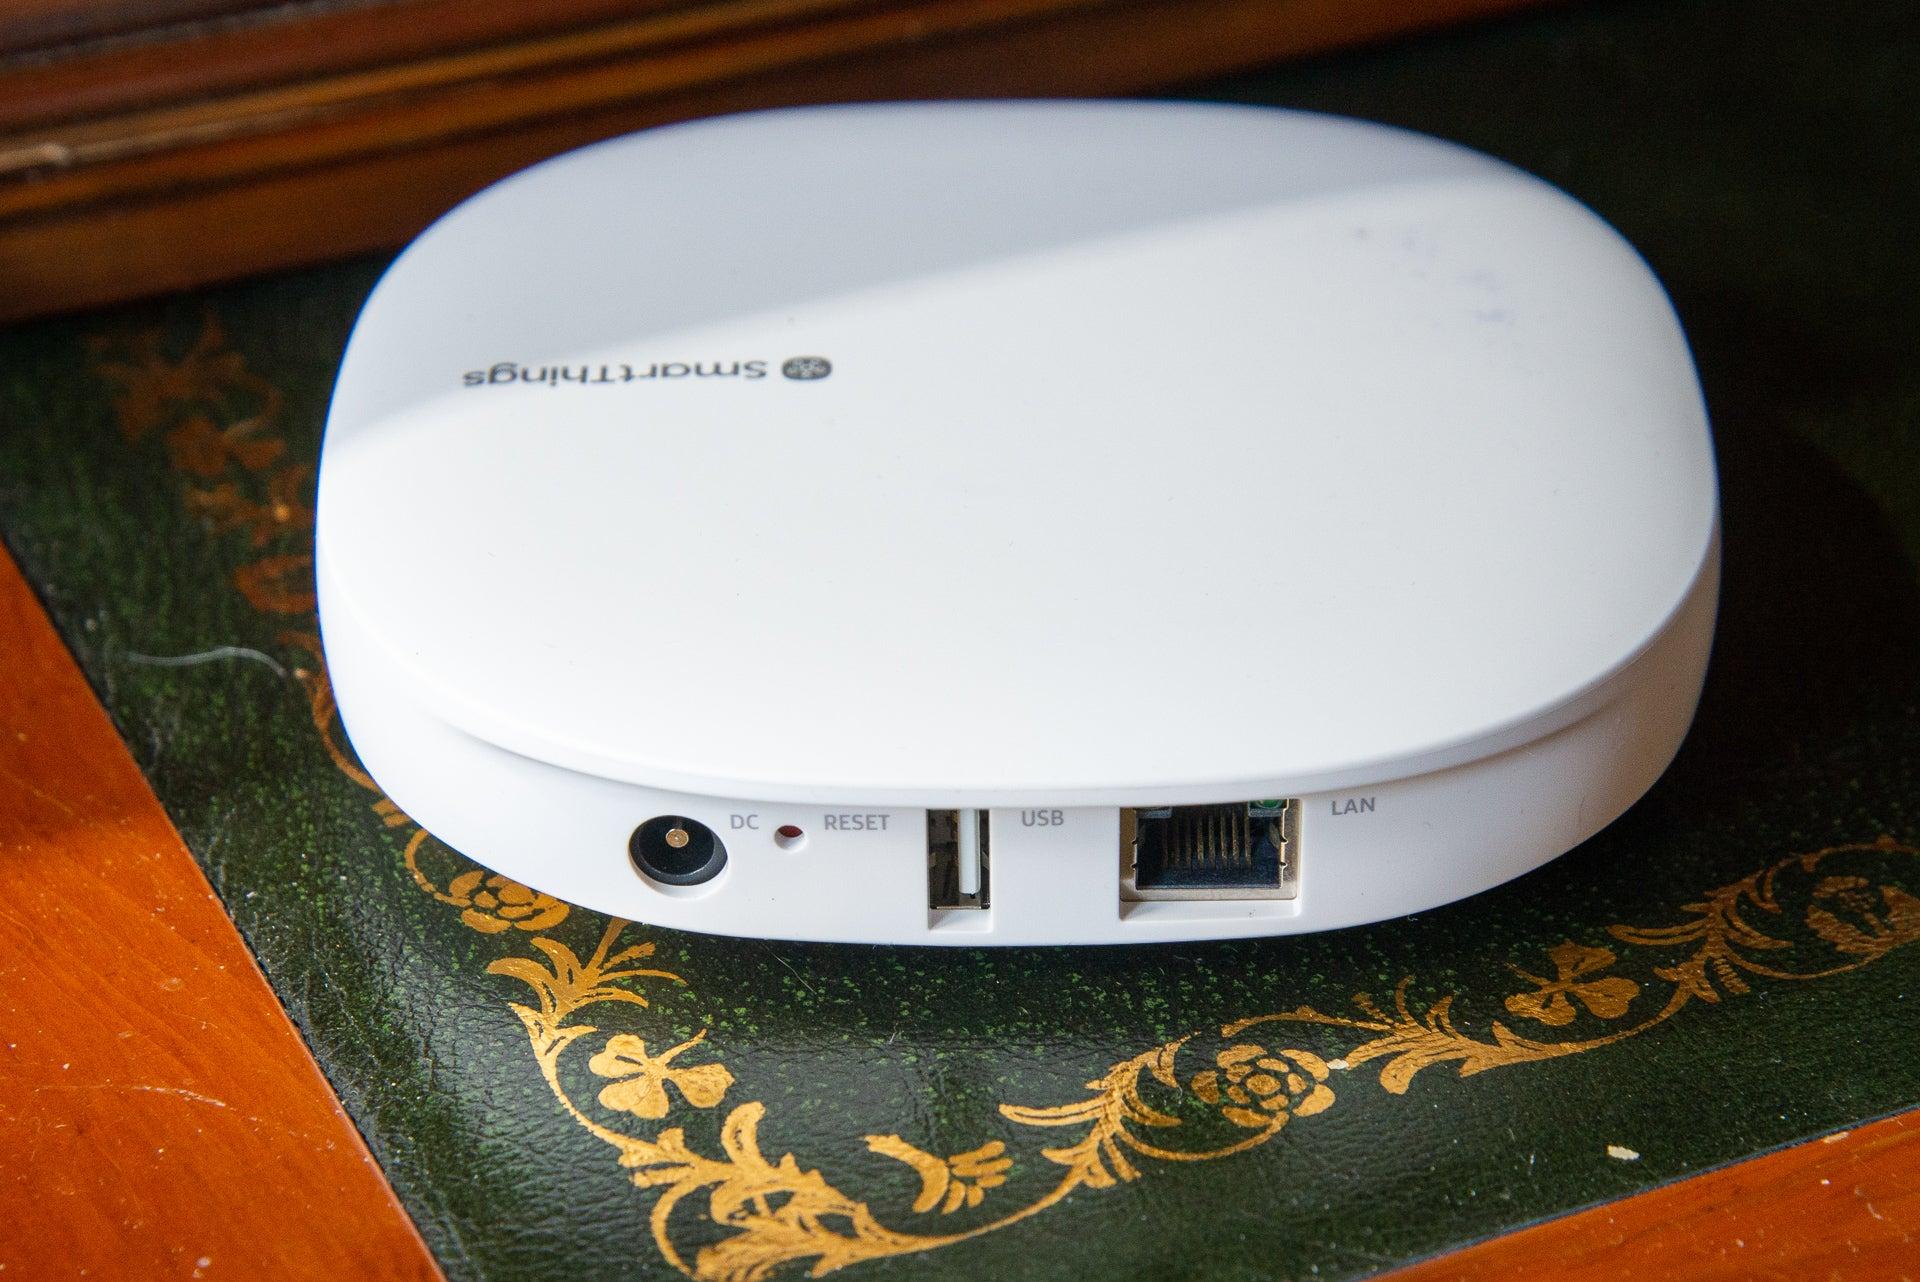 Samsung SmartThings hub ports